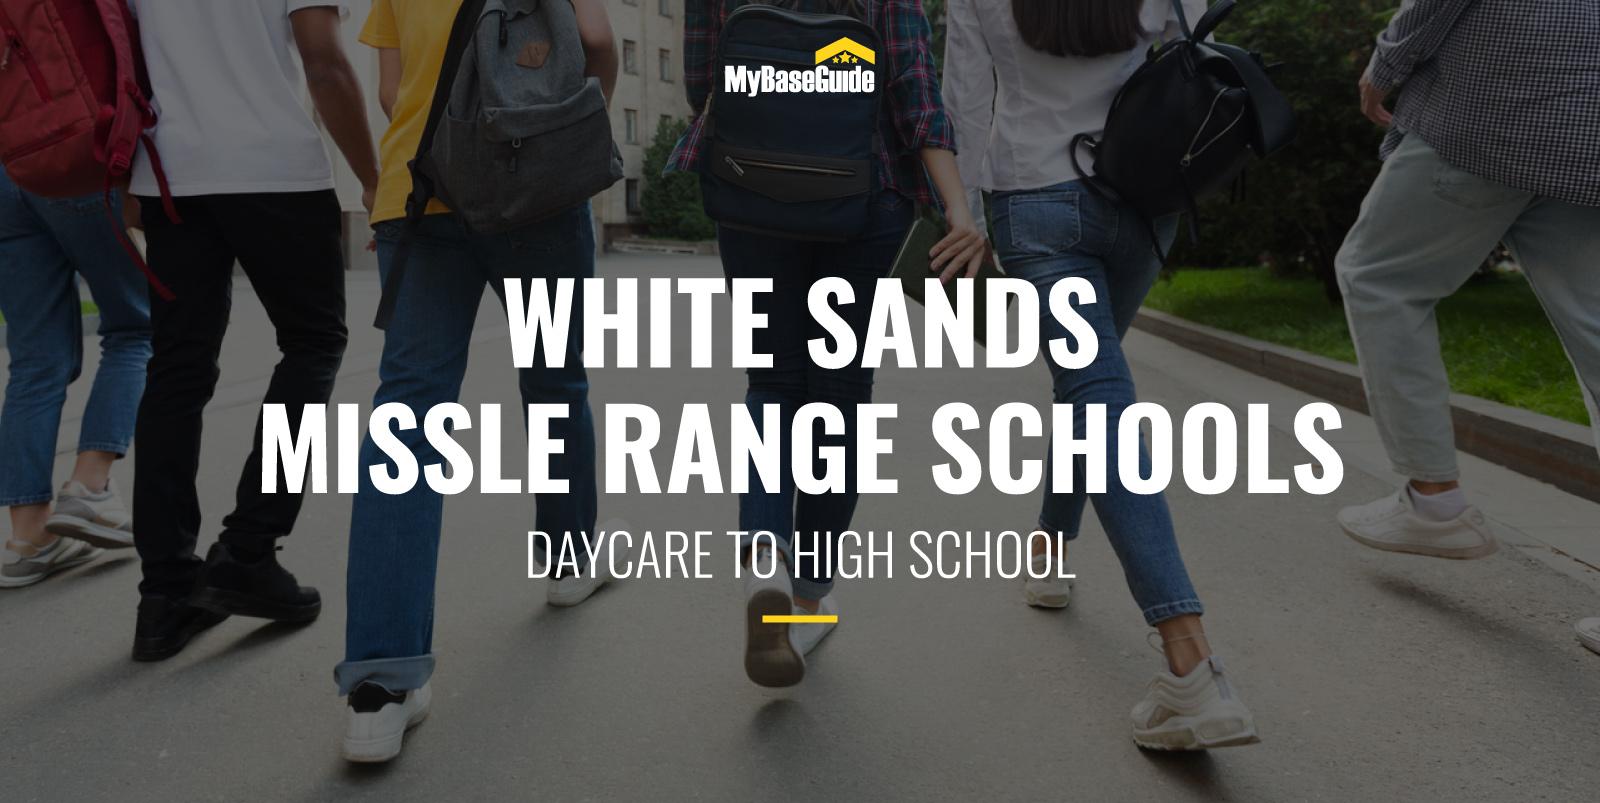 White Sands Missile Range Schools: Daycare - High School